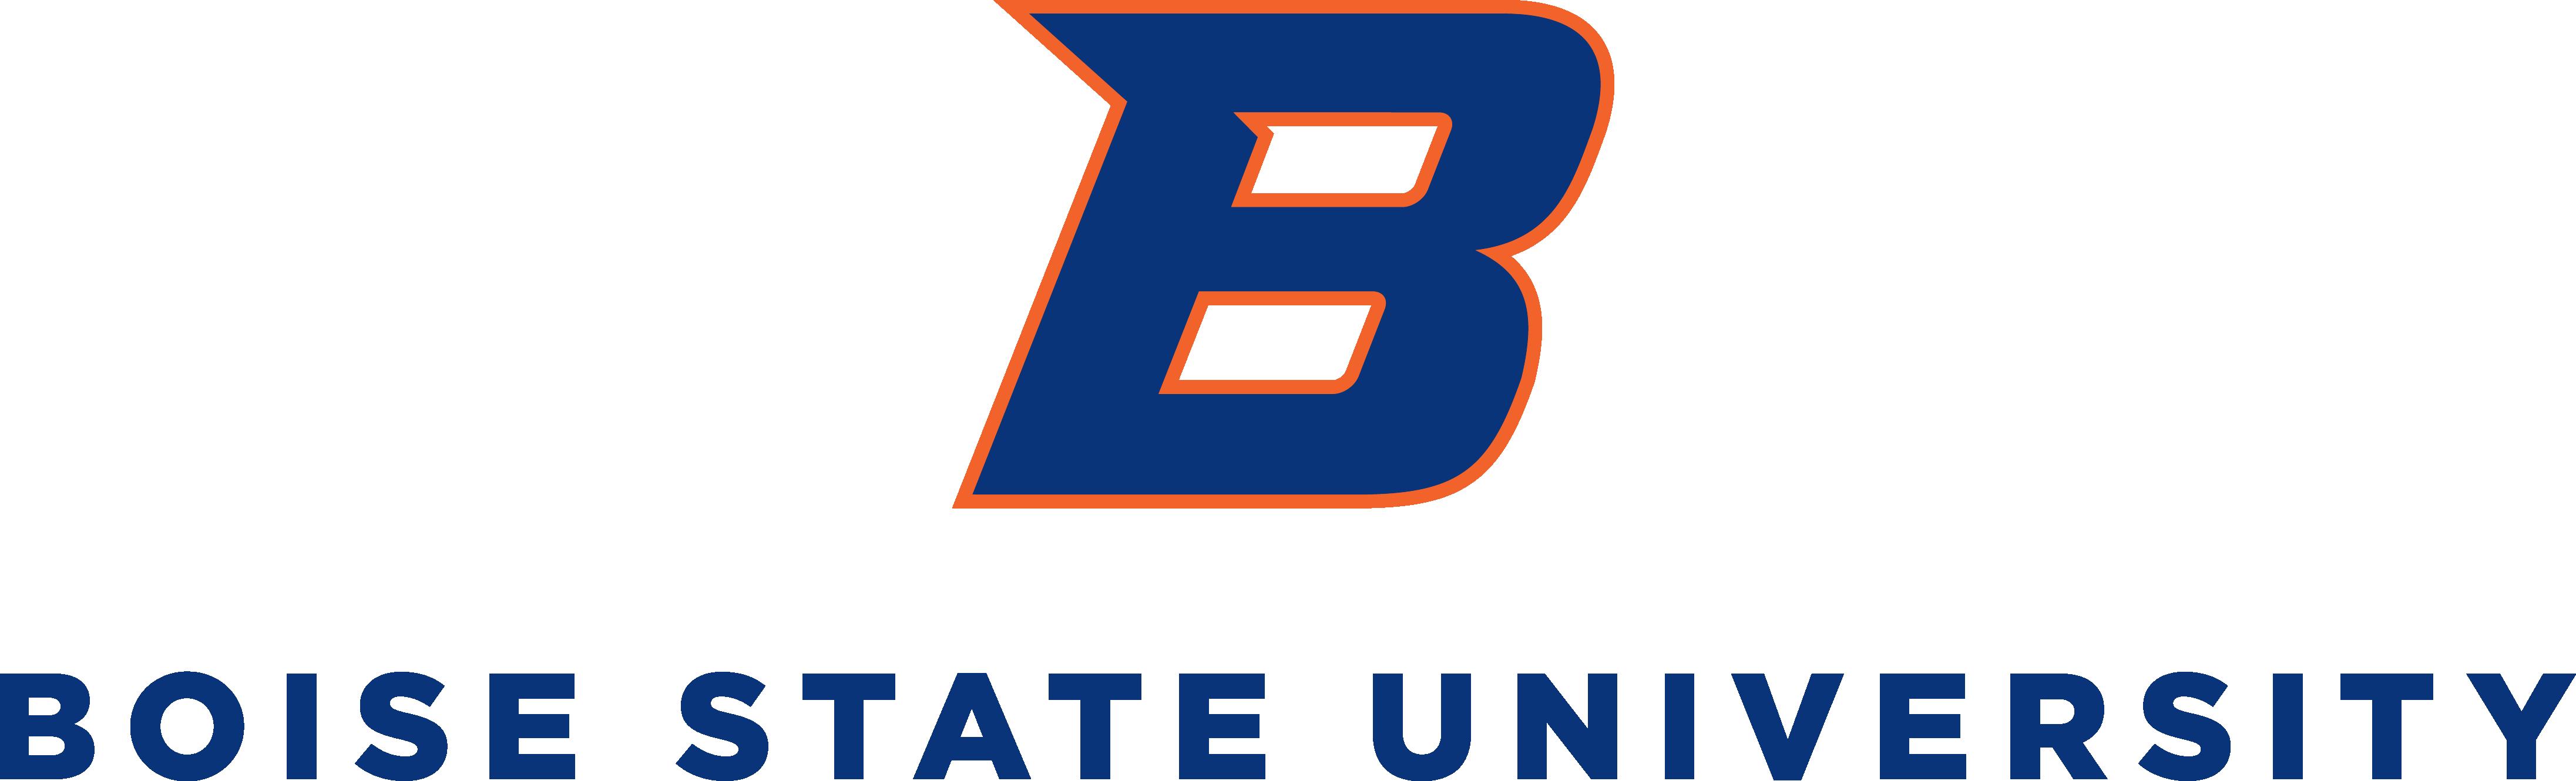 Image result for boise state university logo